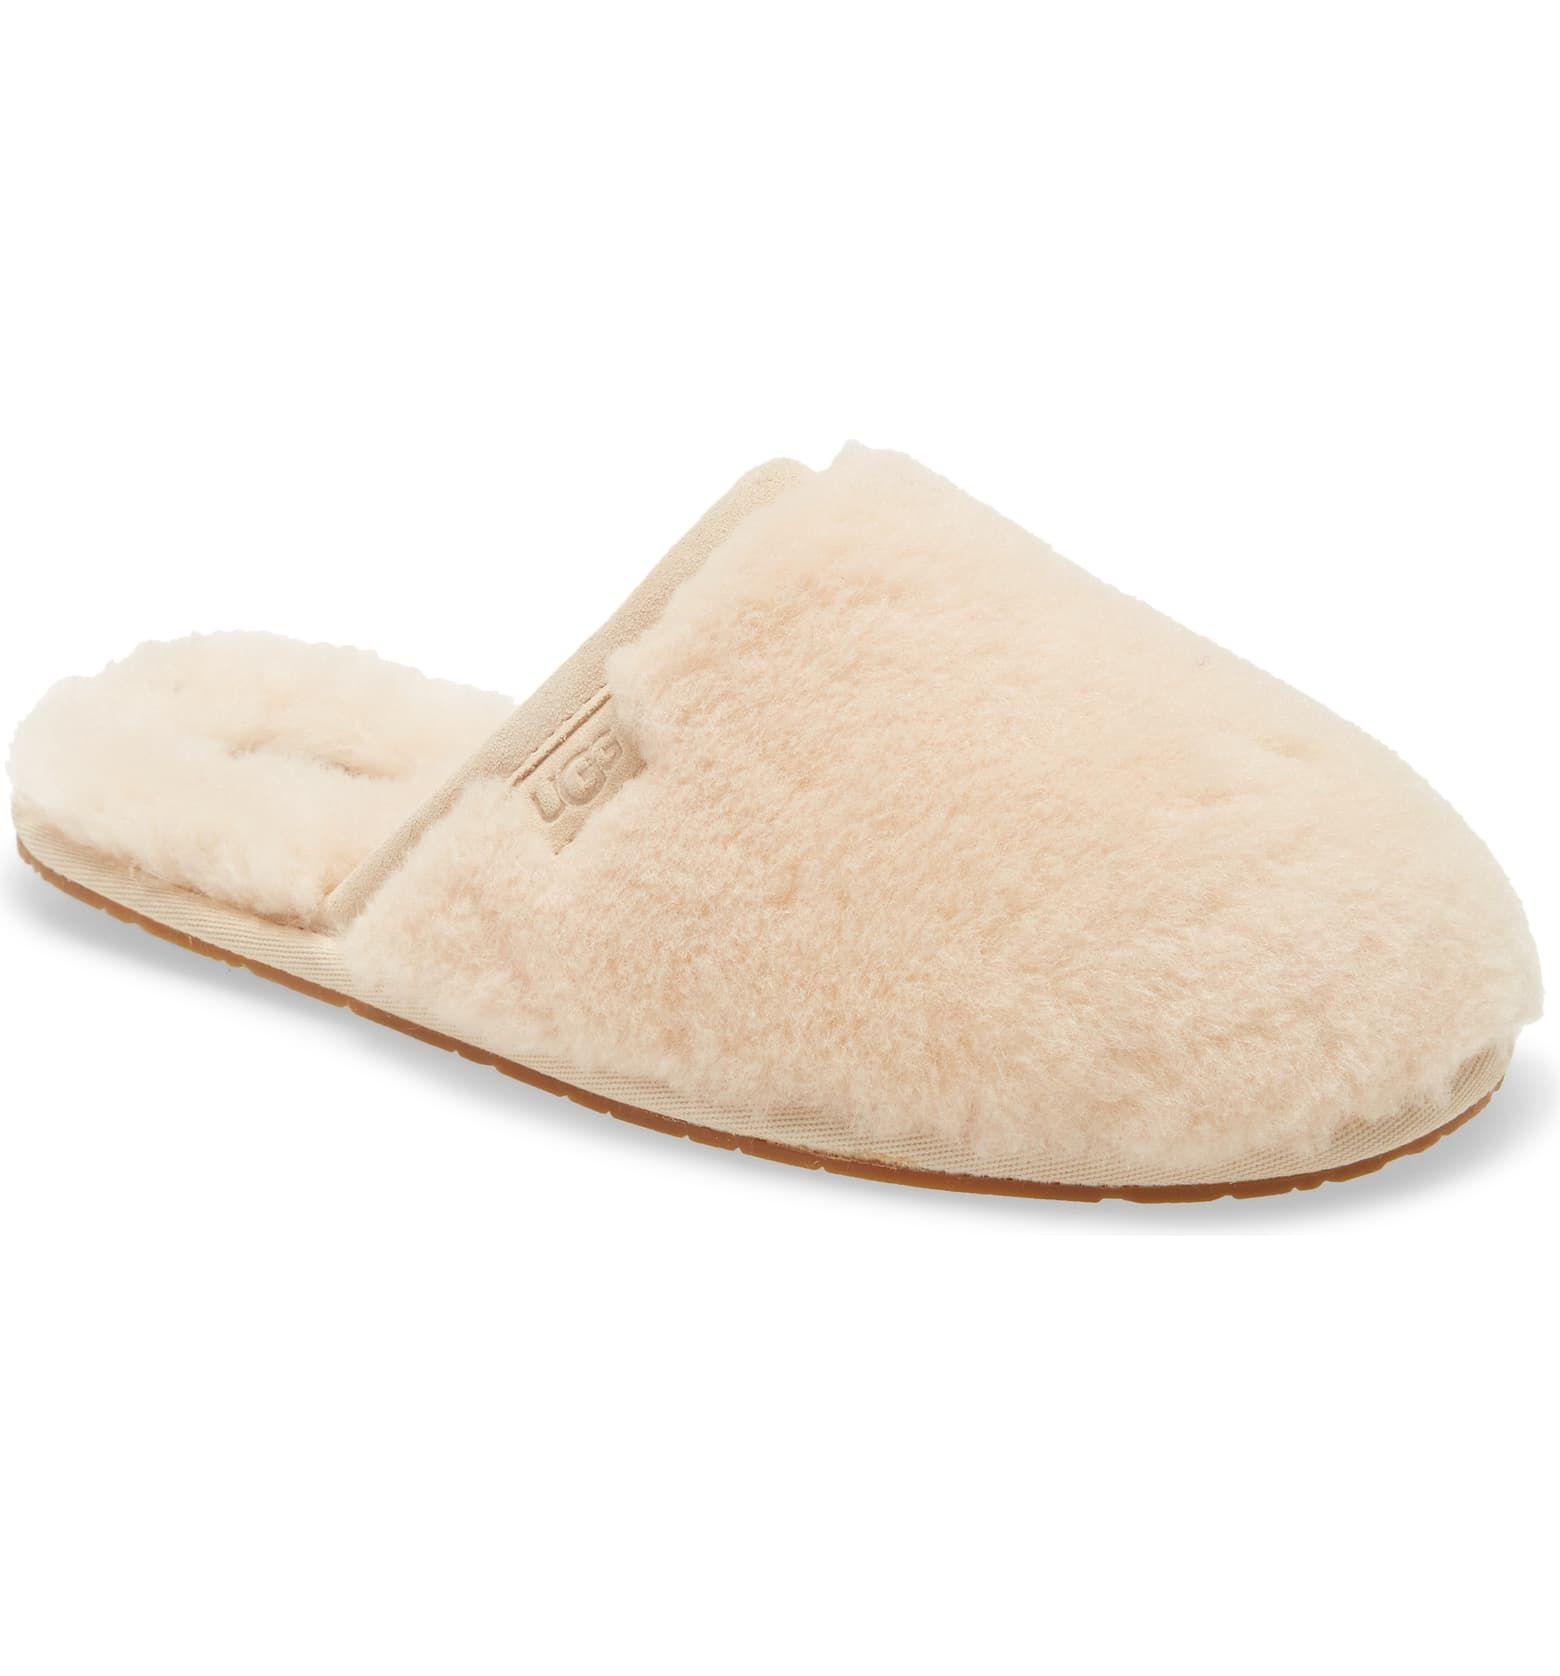 nordstrom slippers sale